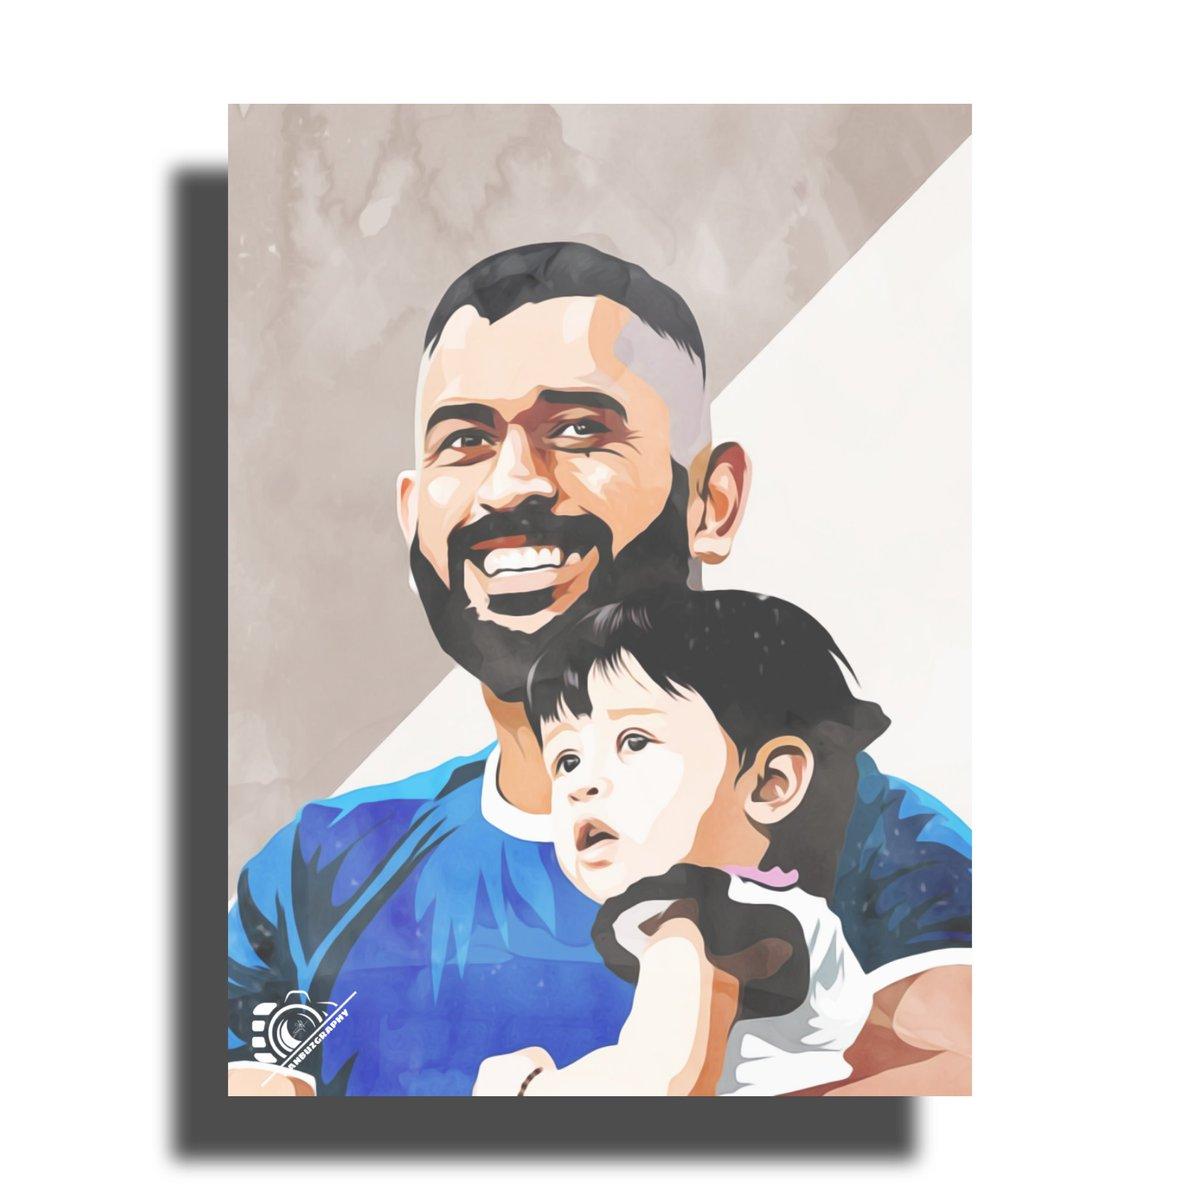 Still 2 days to go for thala @msdhoni birthday #mds #mdsbd #dhonibd #bday #DhoniBirthdayCDP #Dhoni #DhoniBirthdayMashUp #DhoniBirthdayMonth #DhoniBirthdaySpecial #DhoniFanForever #csk #dhonibdaycdp https://t.co/Iy0FM37MtL